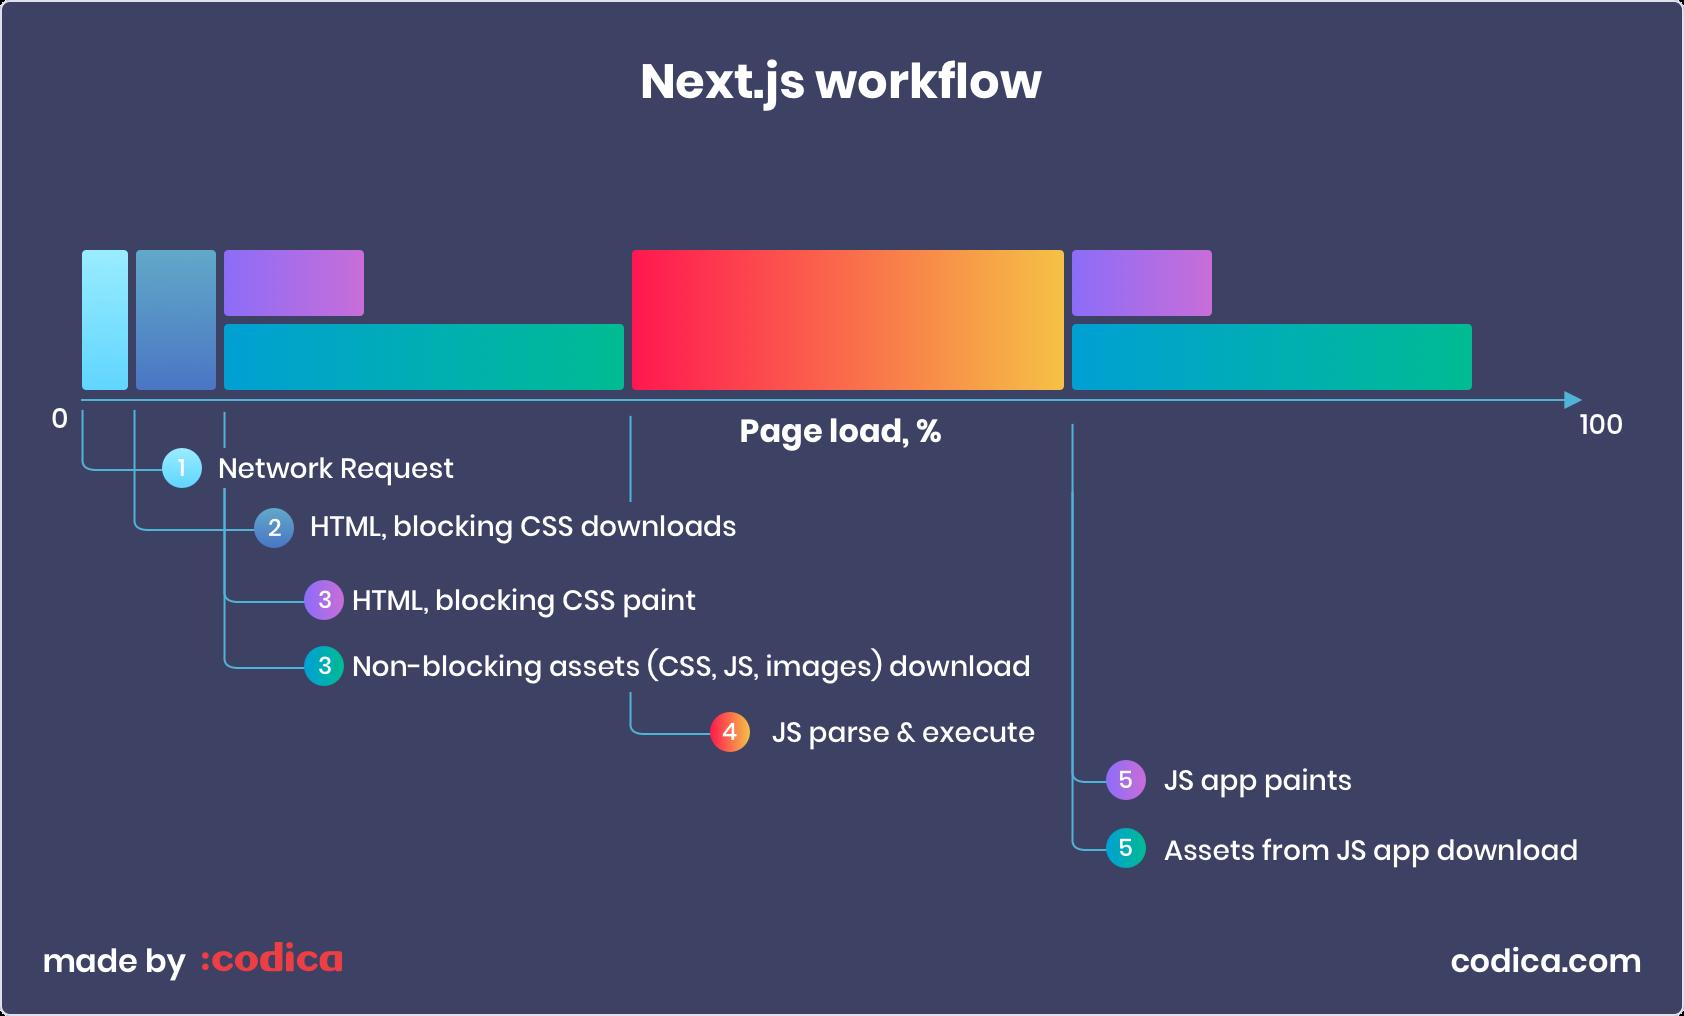 Next.js workflow